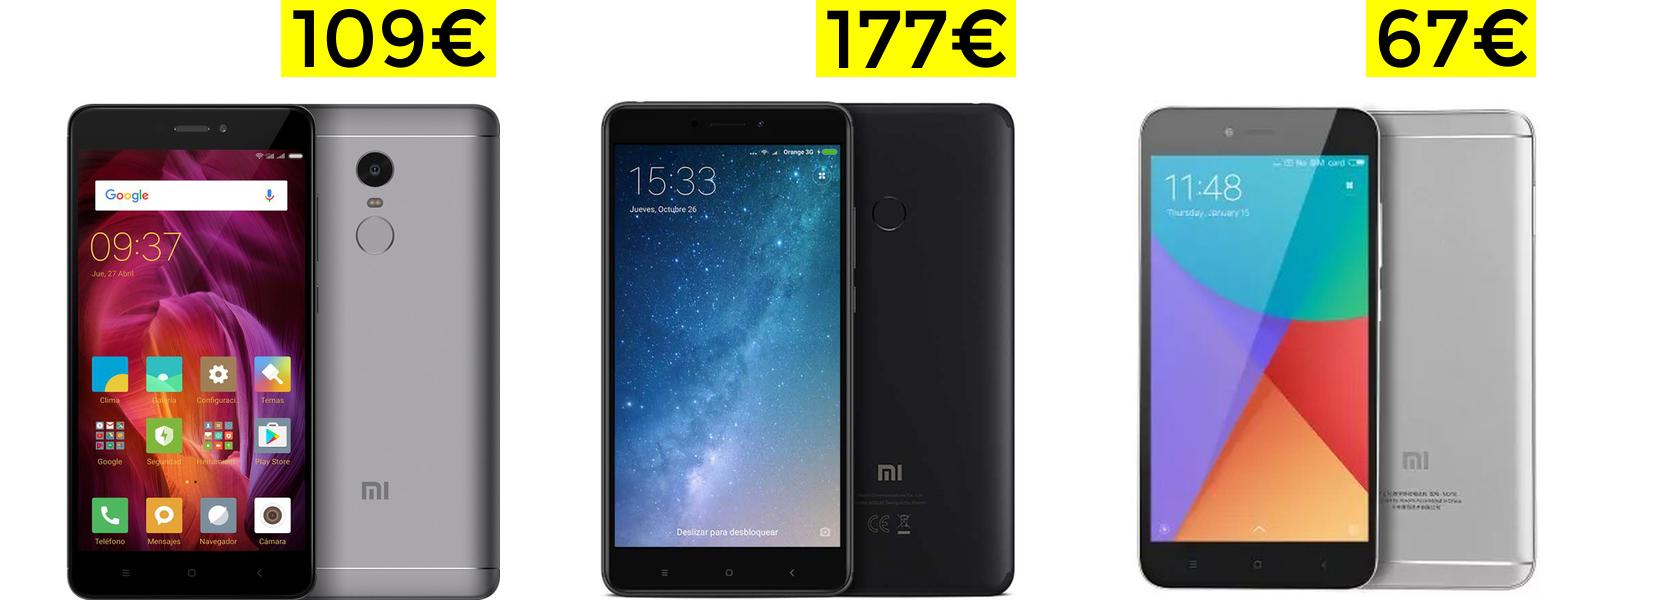 Smartphones Xiaomi desde España a preciazo (Ej: Redmi Note 4 Global a 109€, o 5A a 67€)